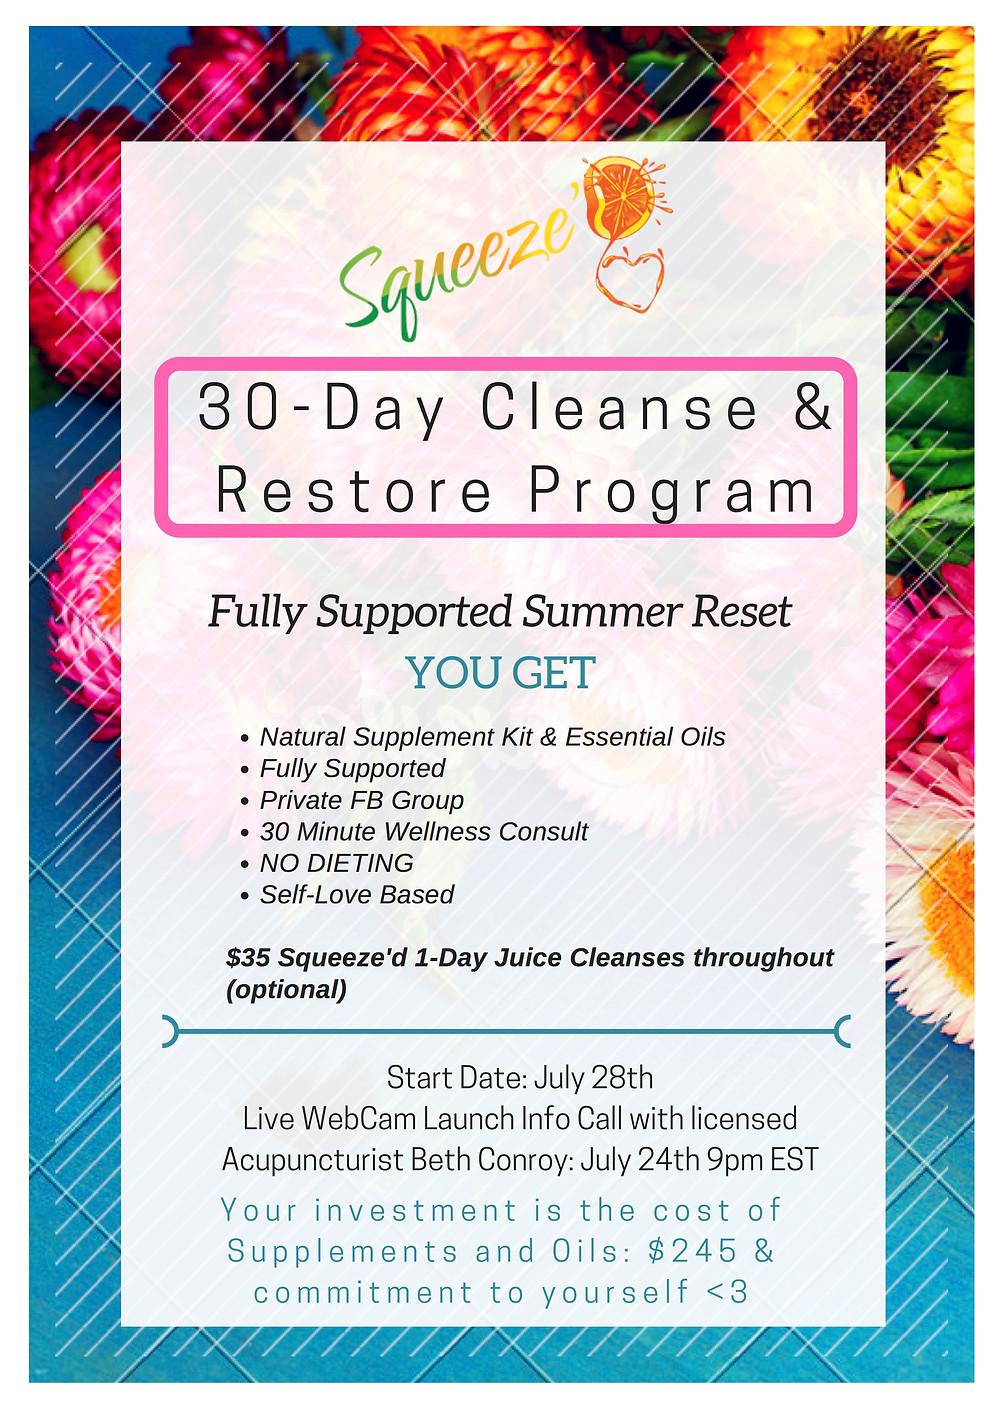 30 Day Cleanse & Restore Program: